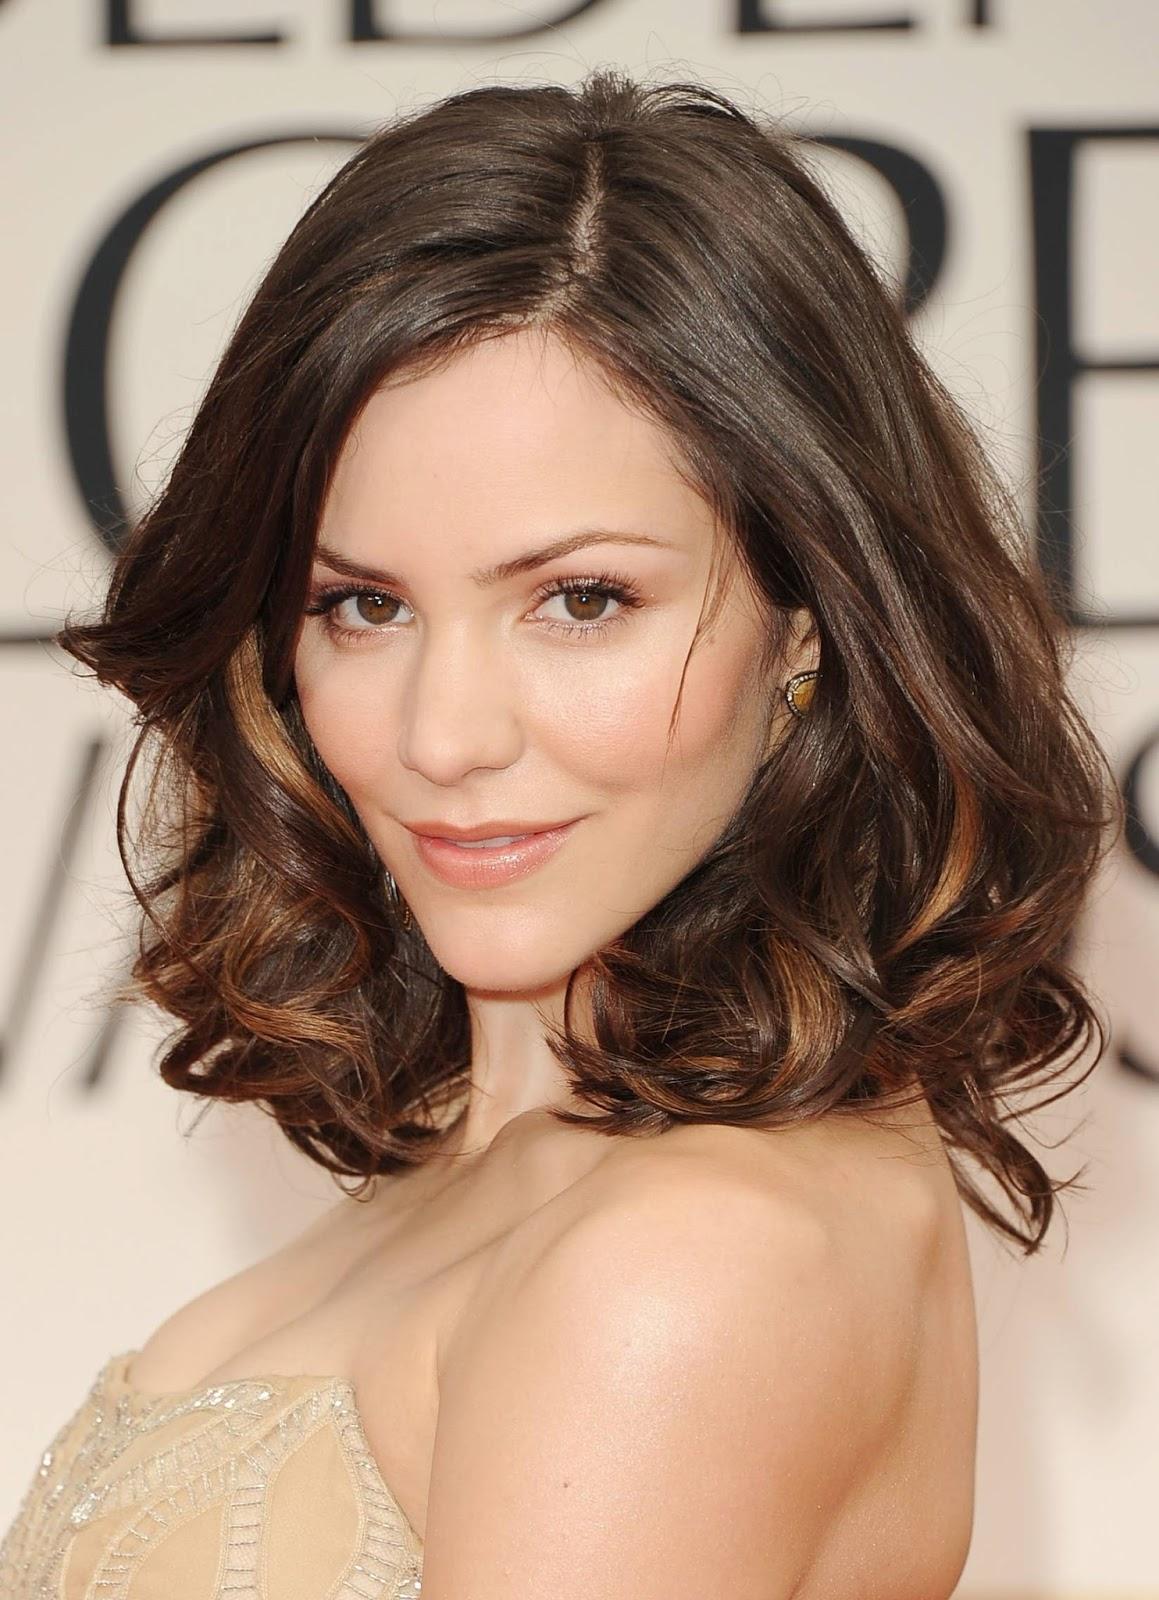 Admirable Cute Easy Hairstyles For Medium Length Hair Carolin Style Hairstyle Inspiration Daily Dogsangcom